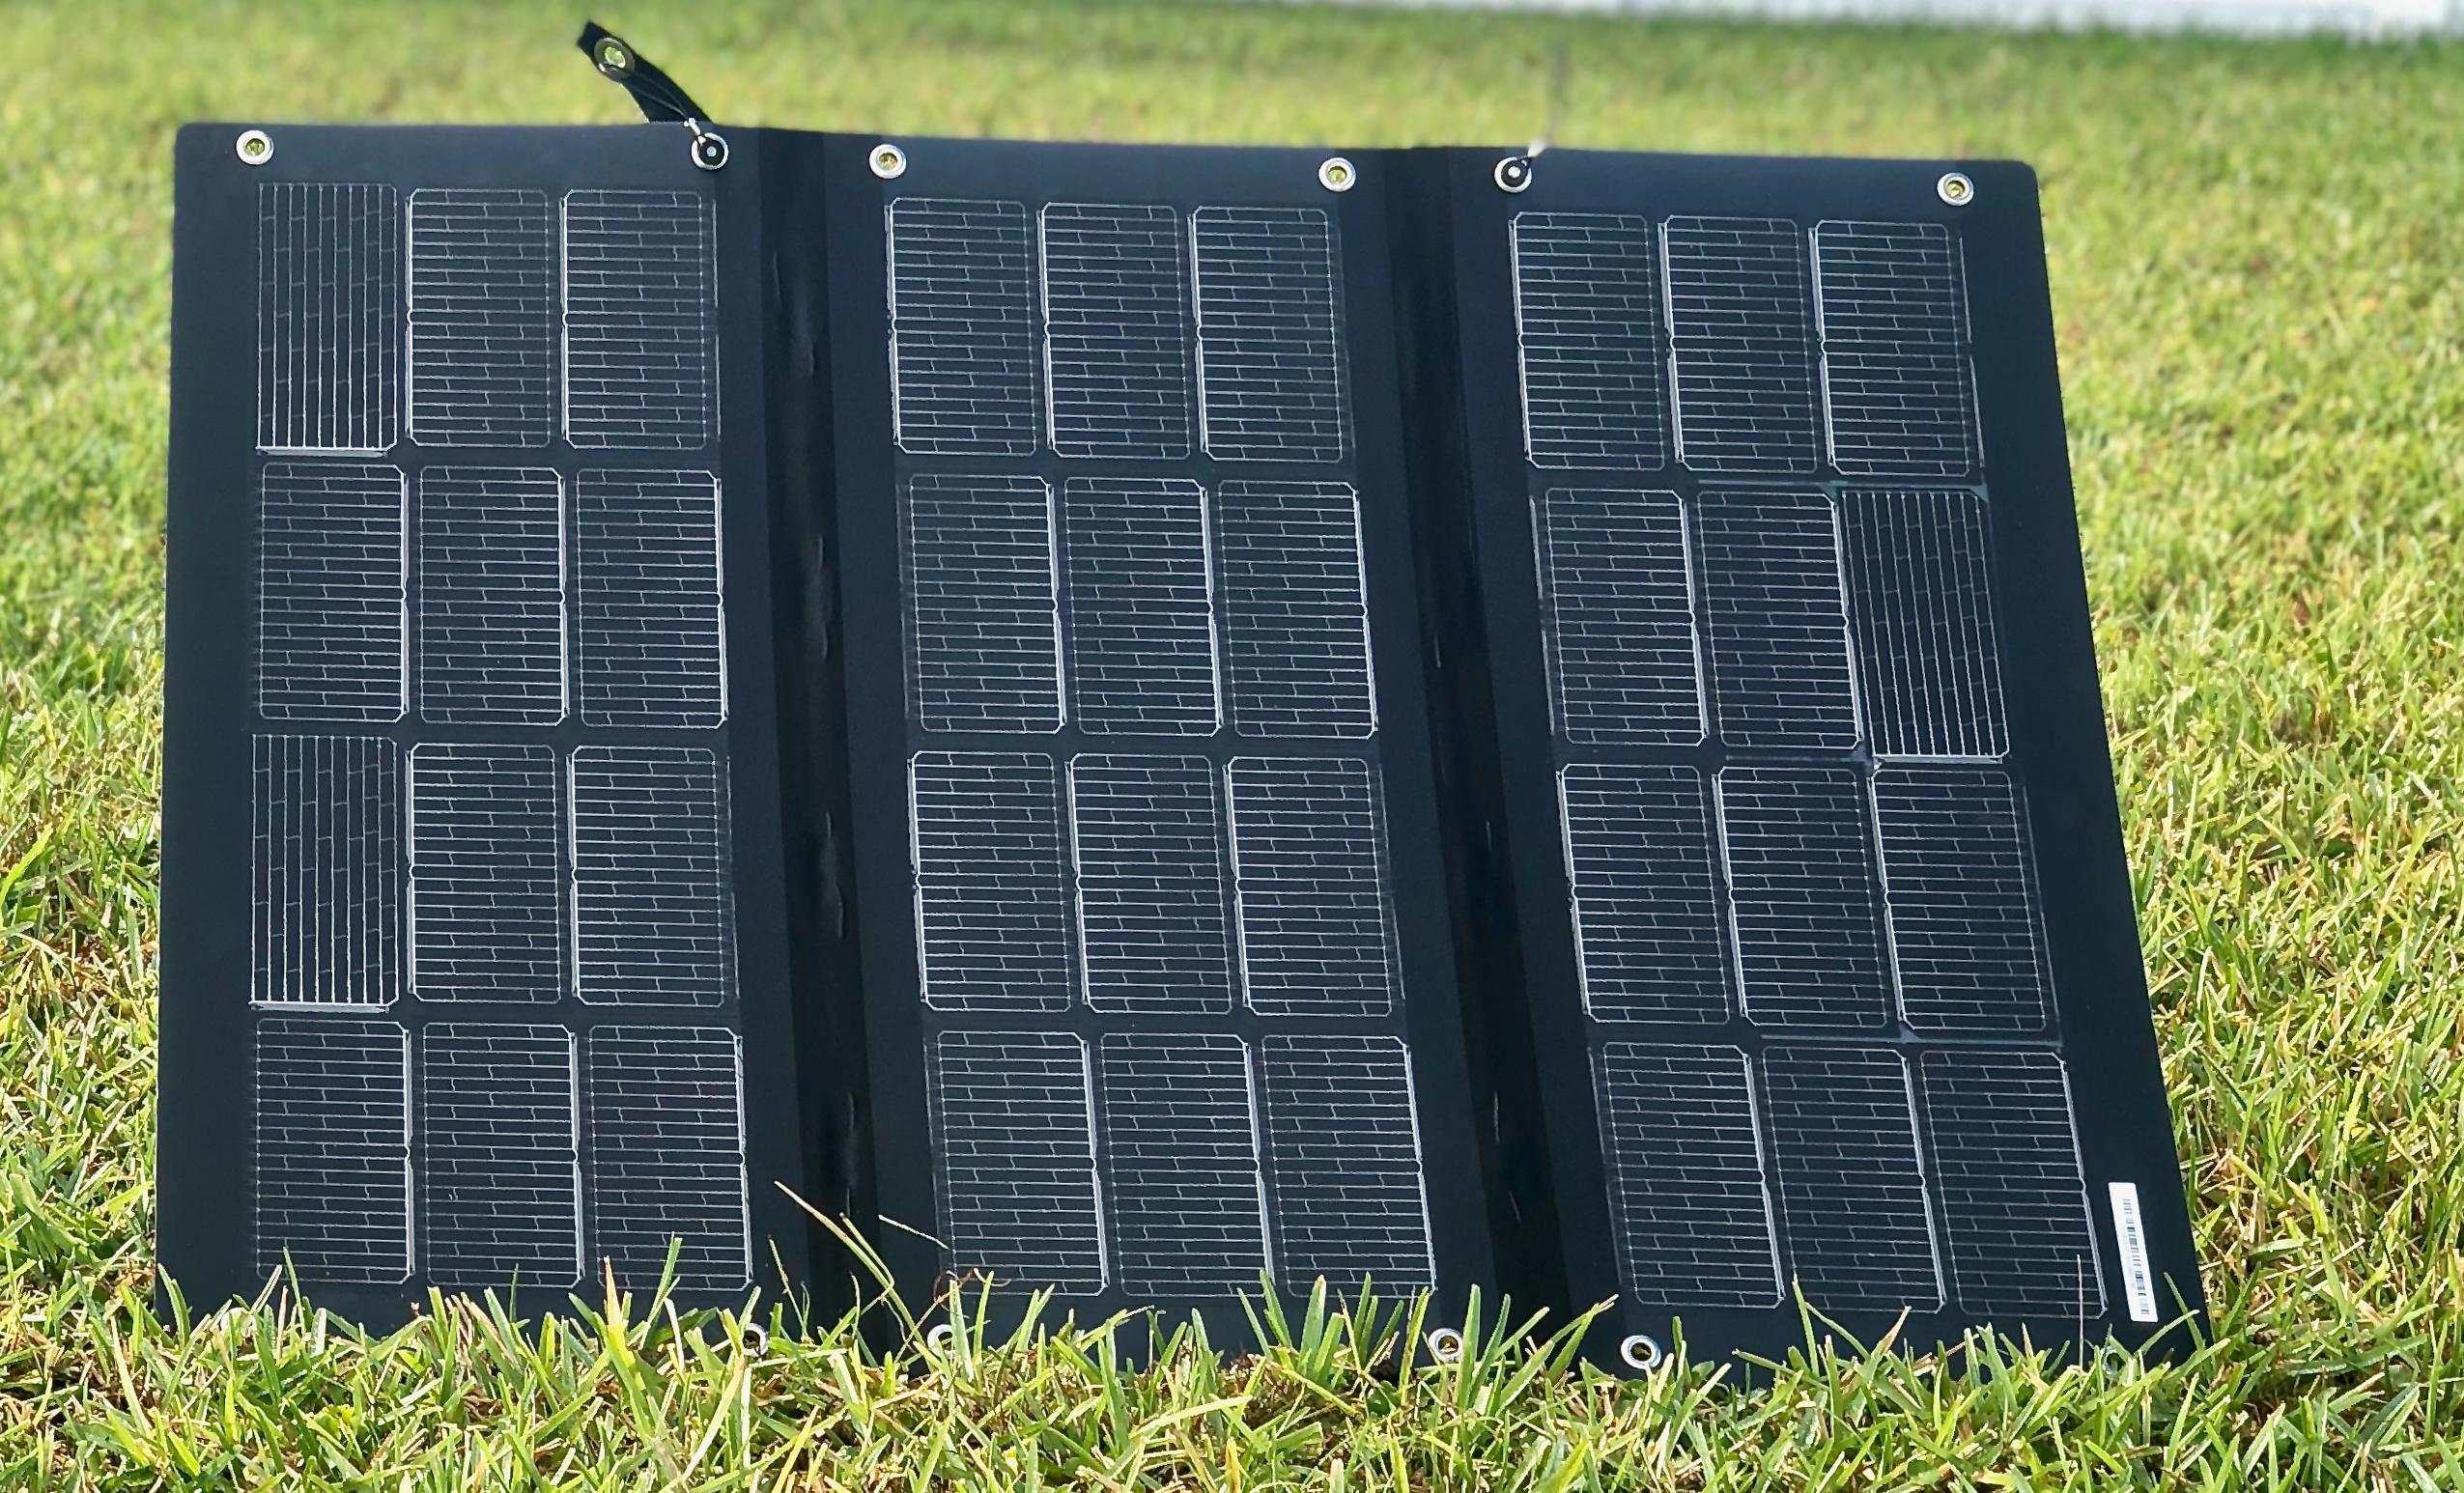 Merlin Solar Technologies, Inc. San Jose (844)637-5461